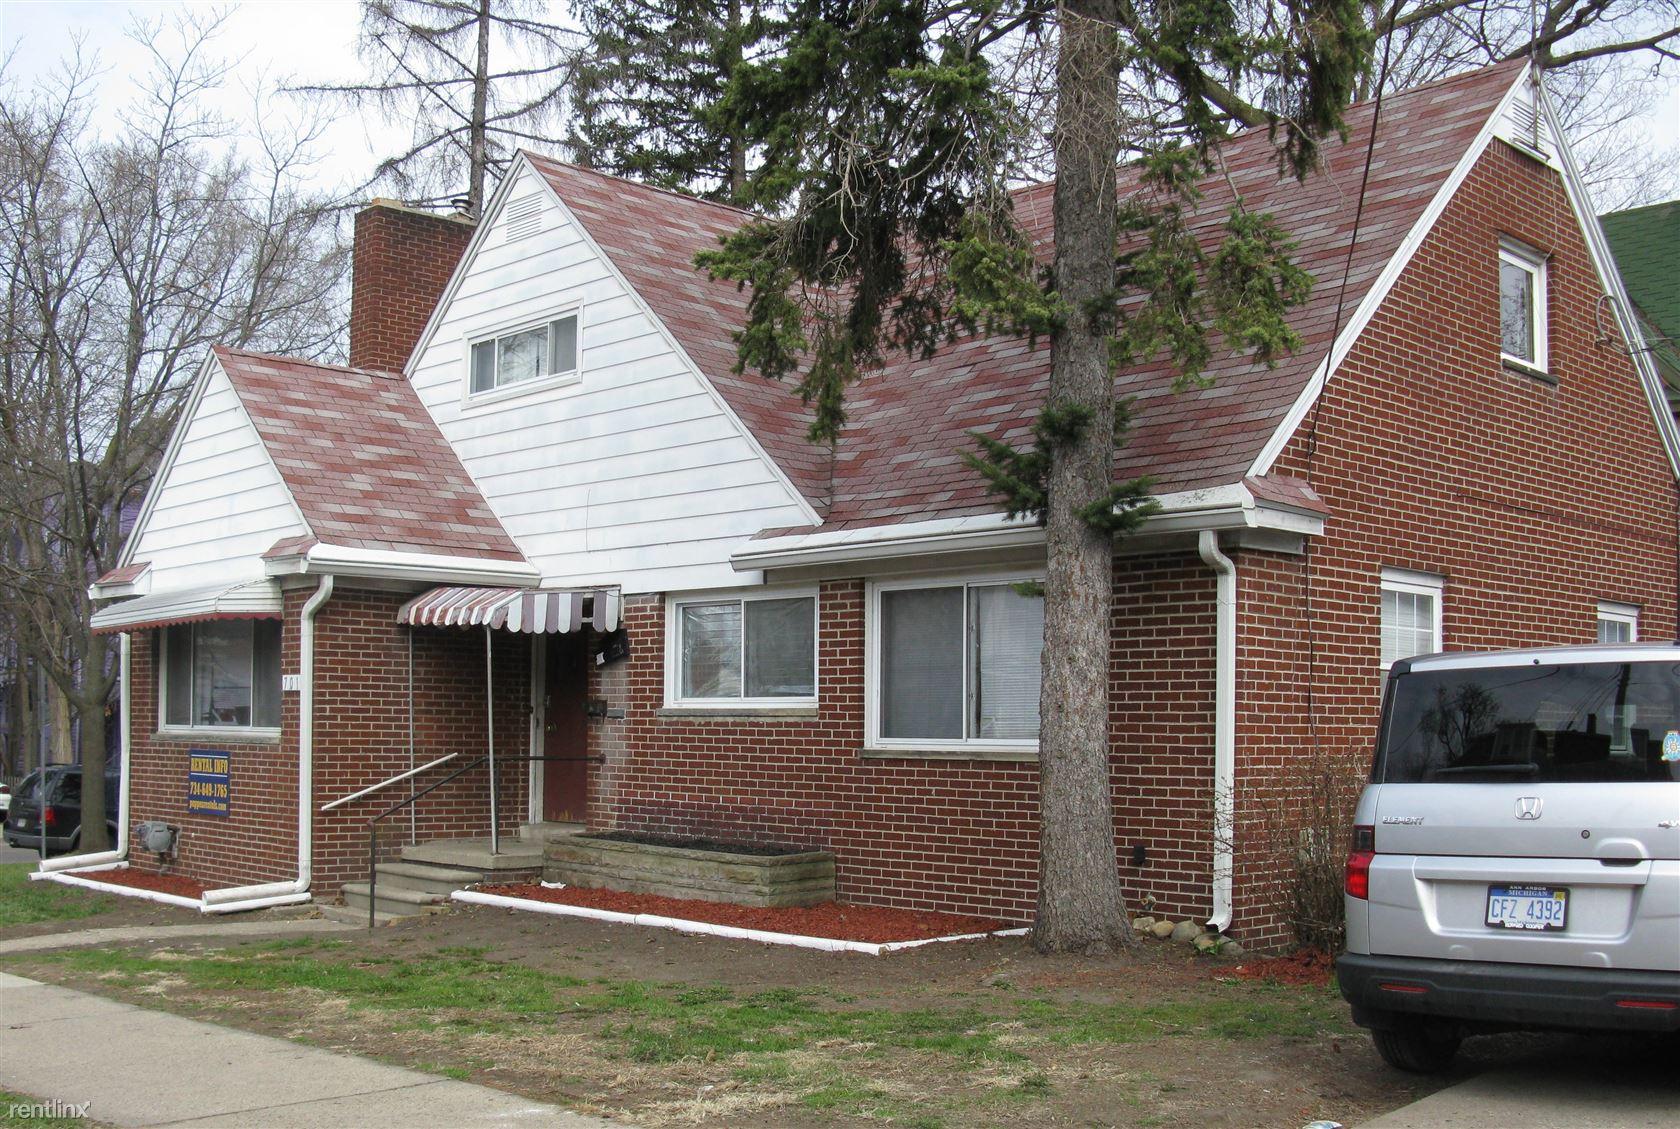 701 Catherine St, Ann Arbor, MI - $5,400